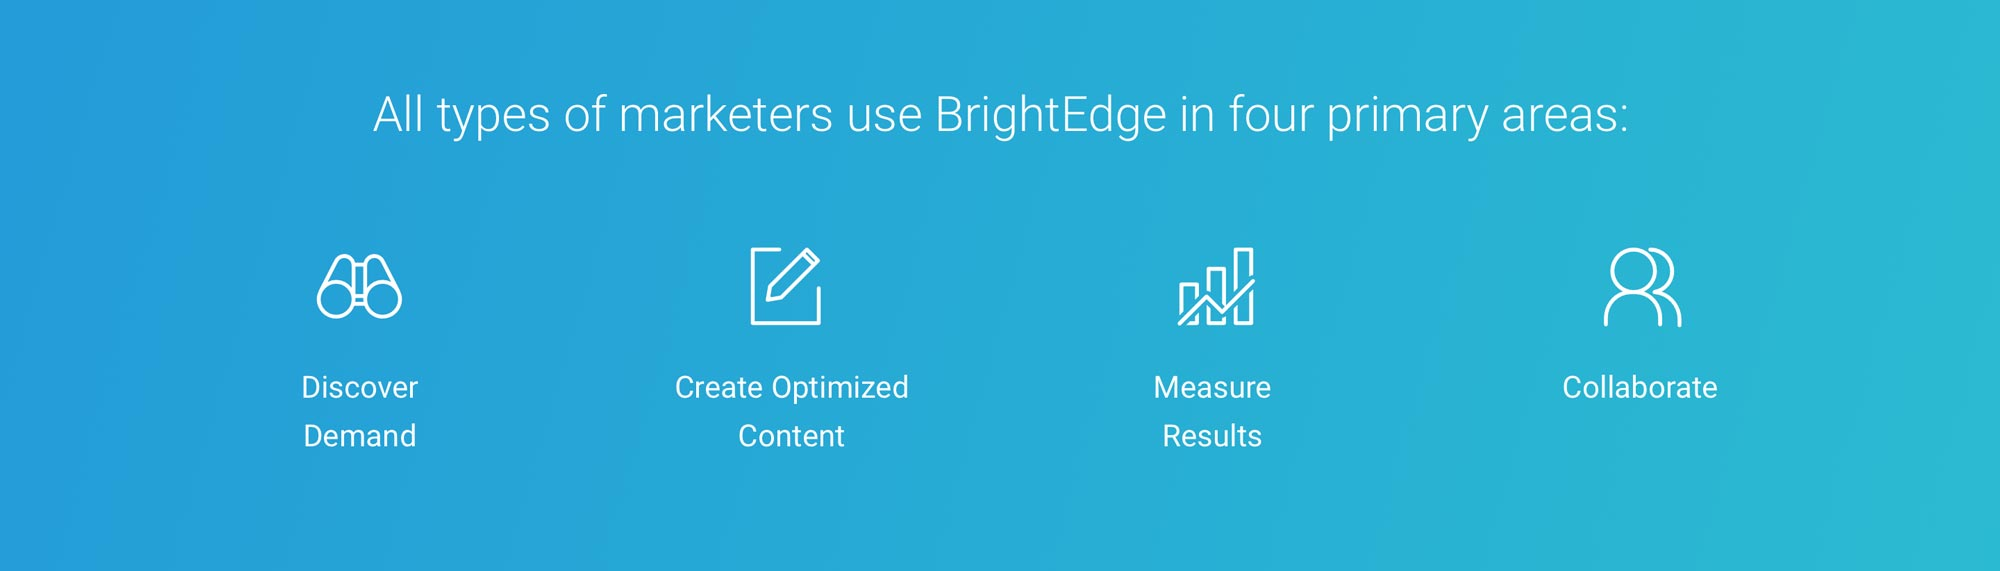 BrightEdge 4 pillars of SEO management